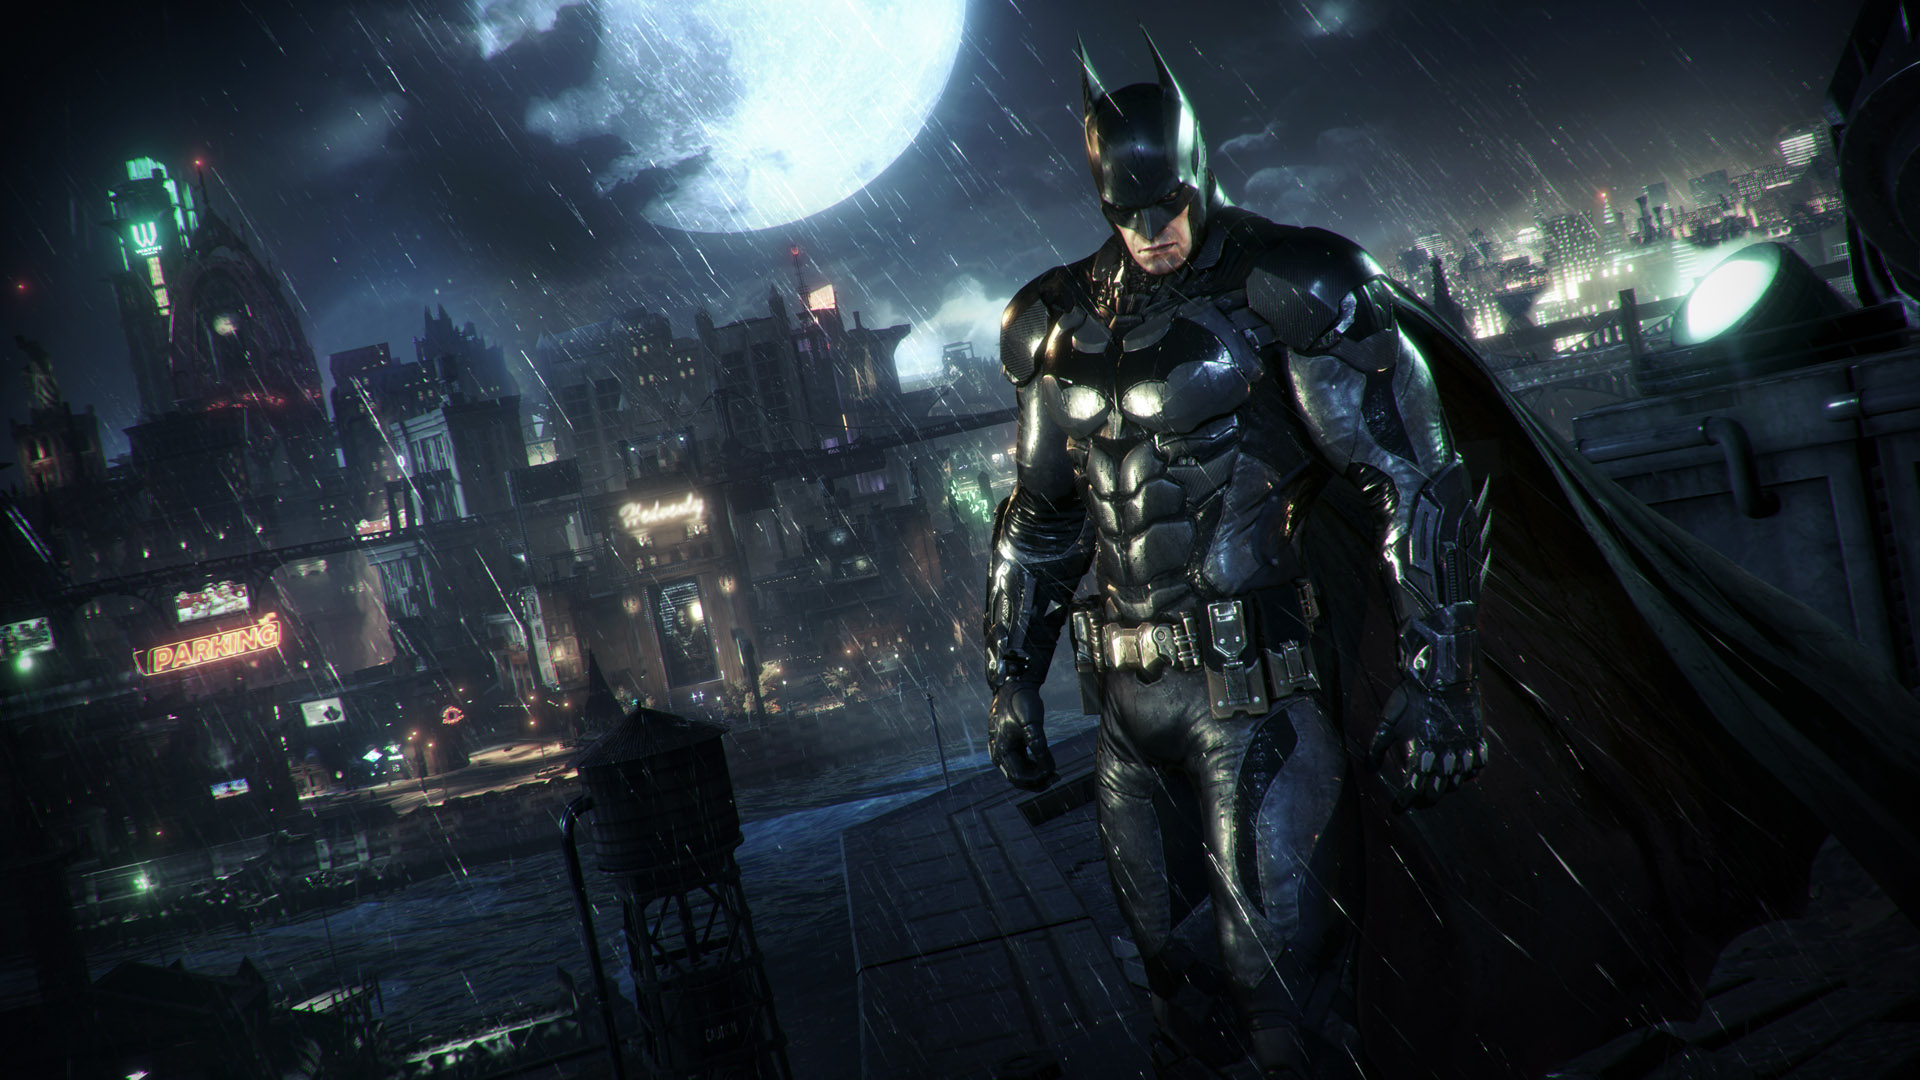 Still From Batman Arkham Knight Image Courtesy Warner Bros Entertainment